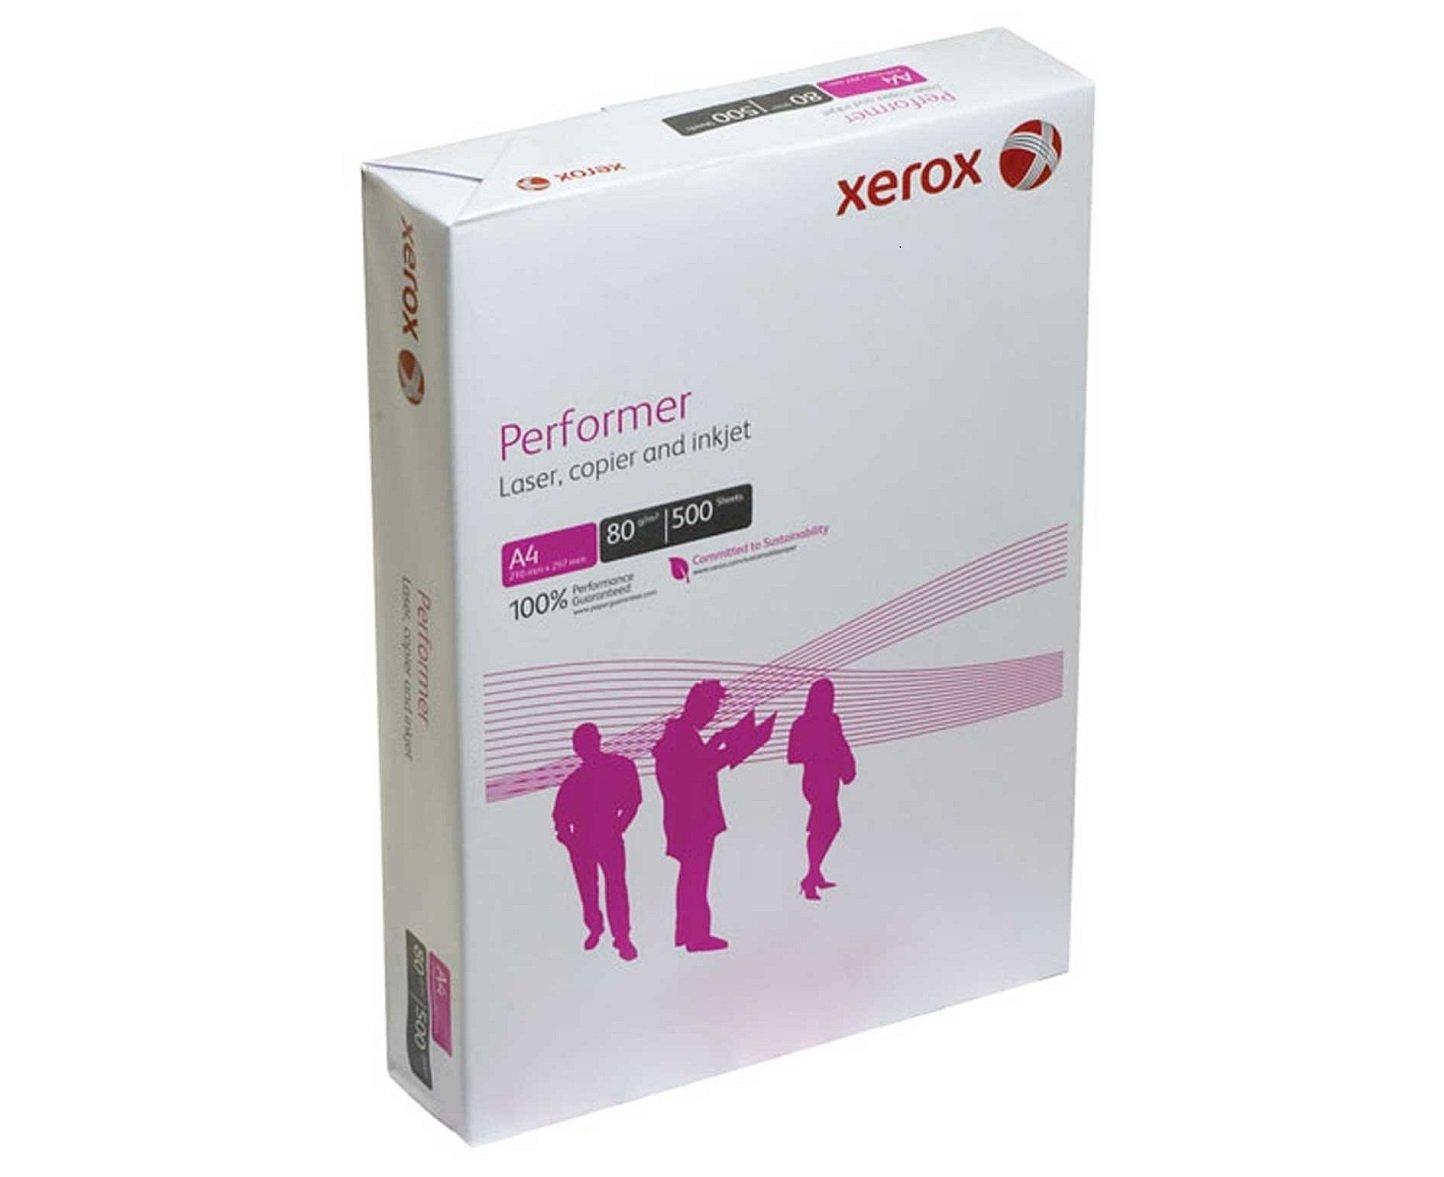 Бумага Xerox офисная A4 Performer 80г/м2 500л, Class C (003R90649) фото